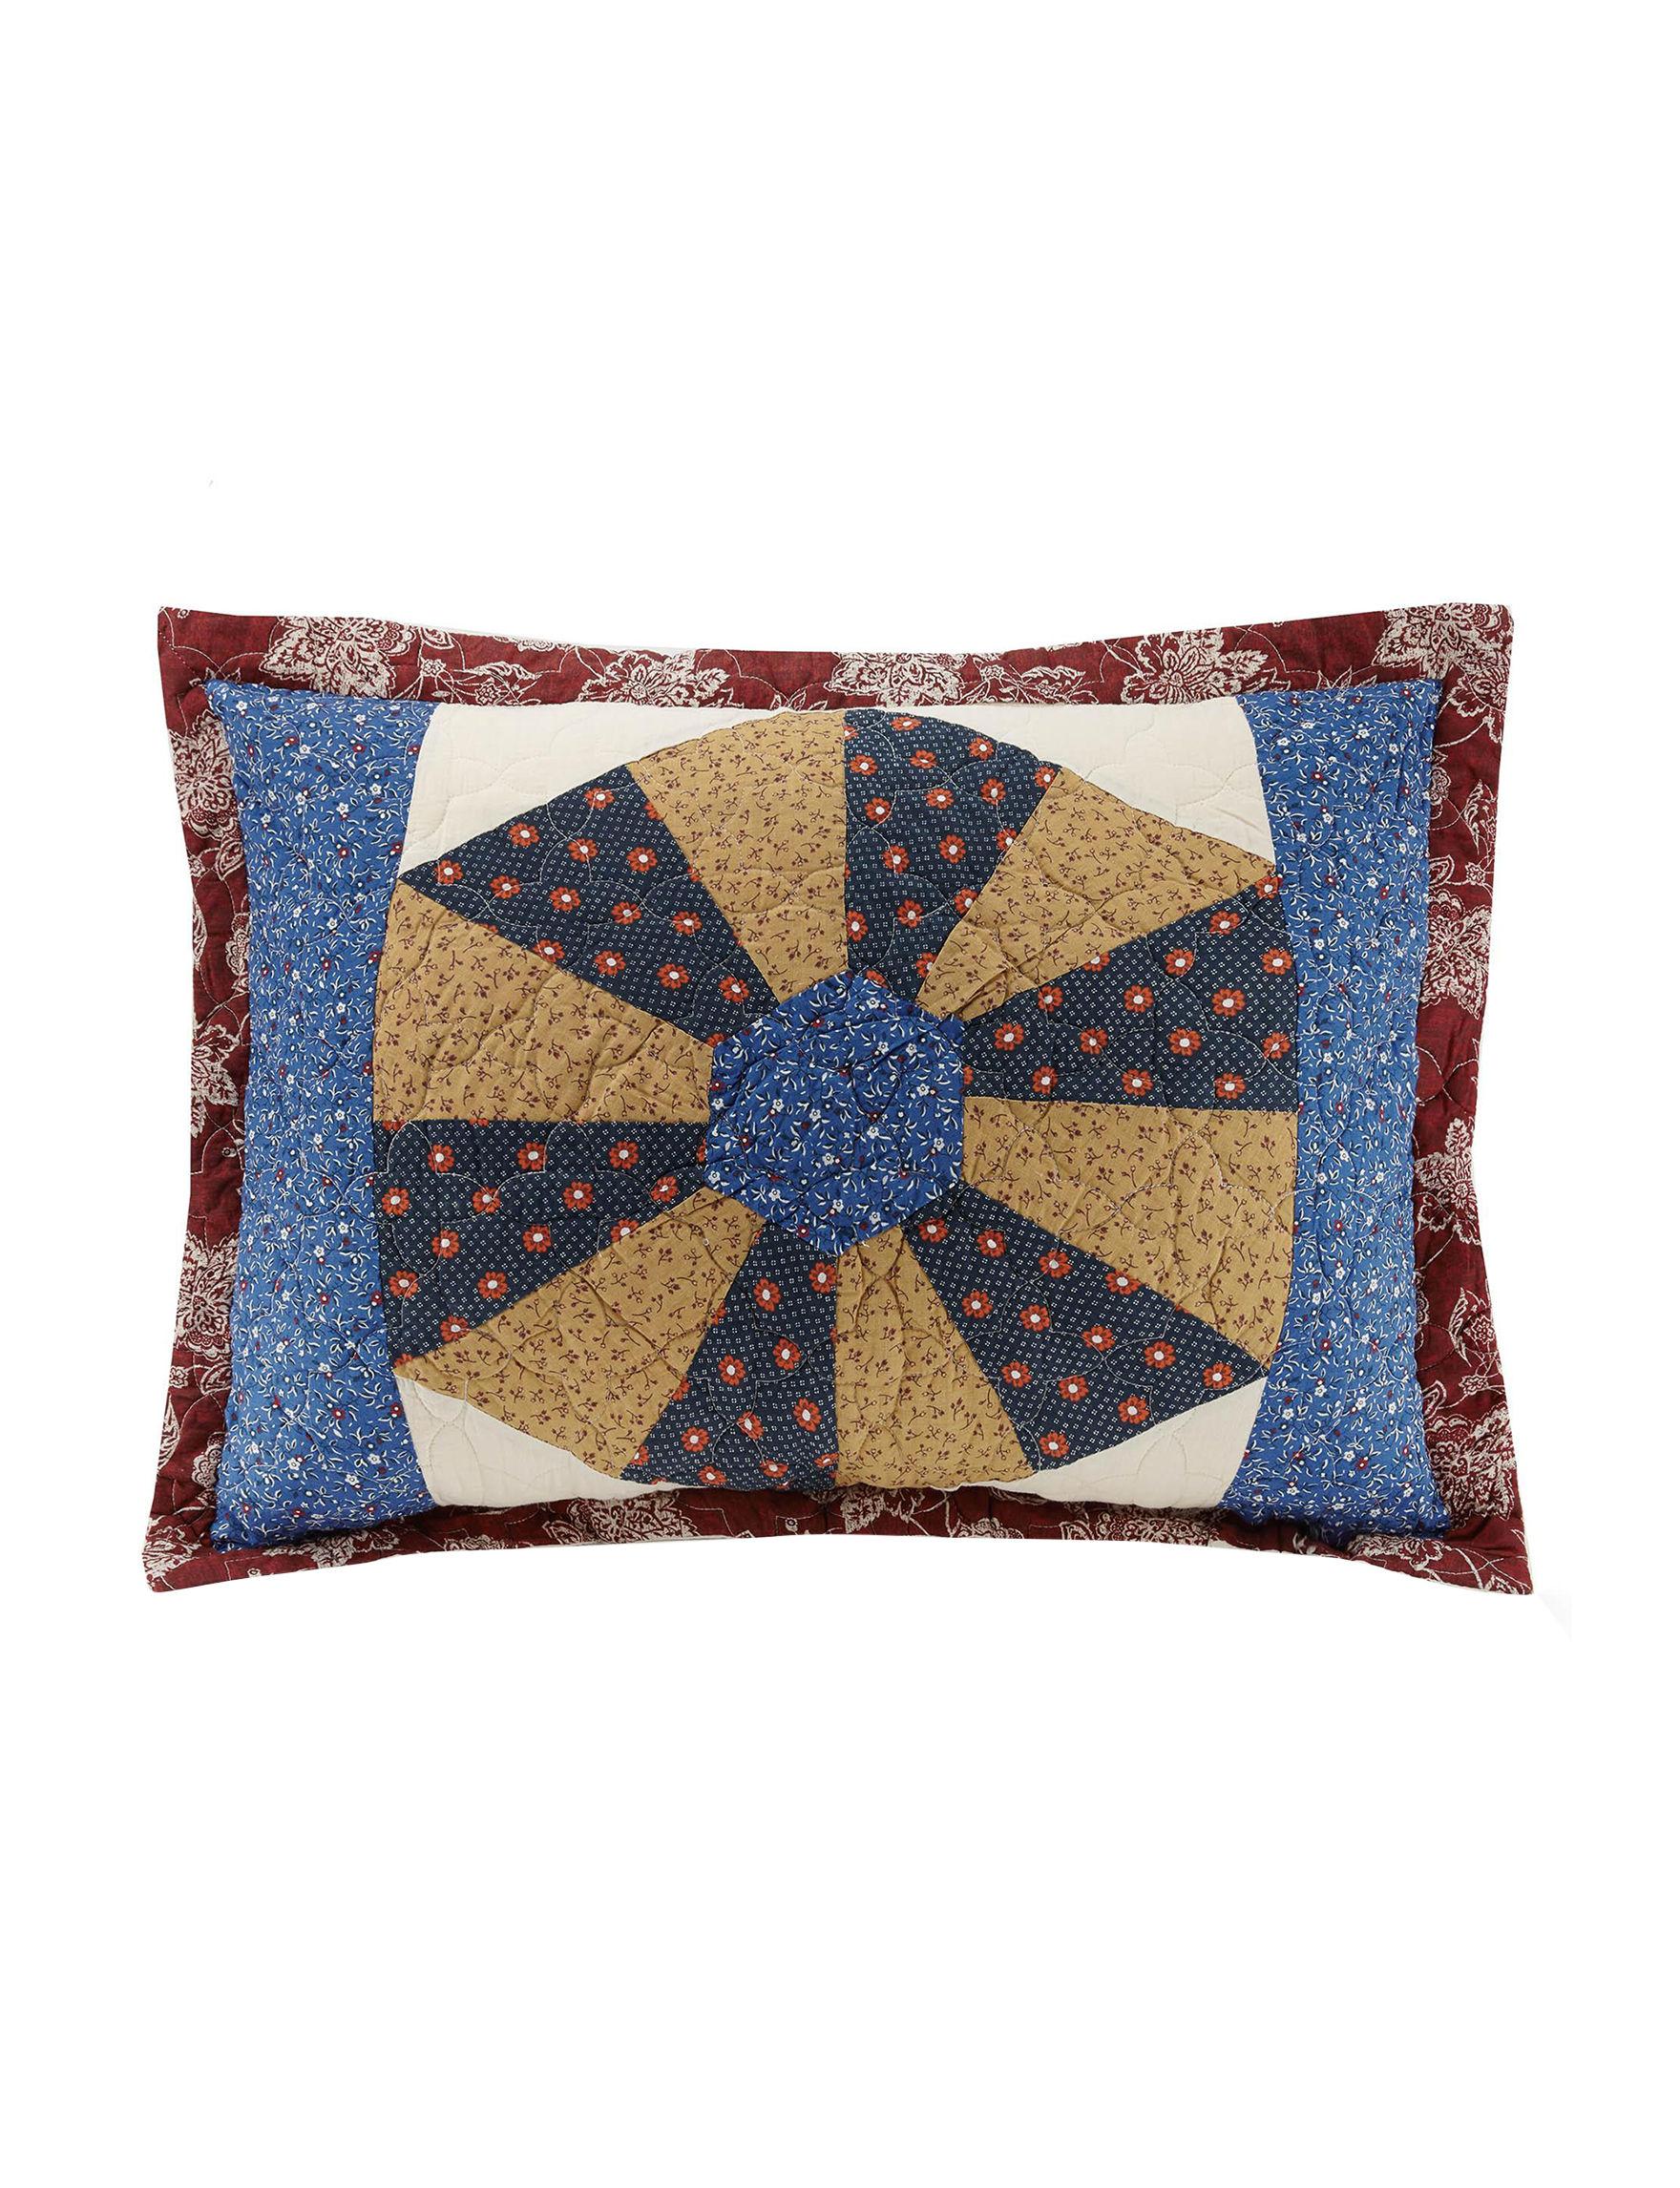 Mary Jane's Home Blue Multi Pillow Shams